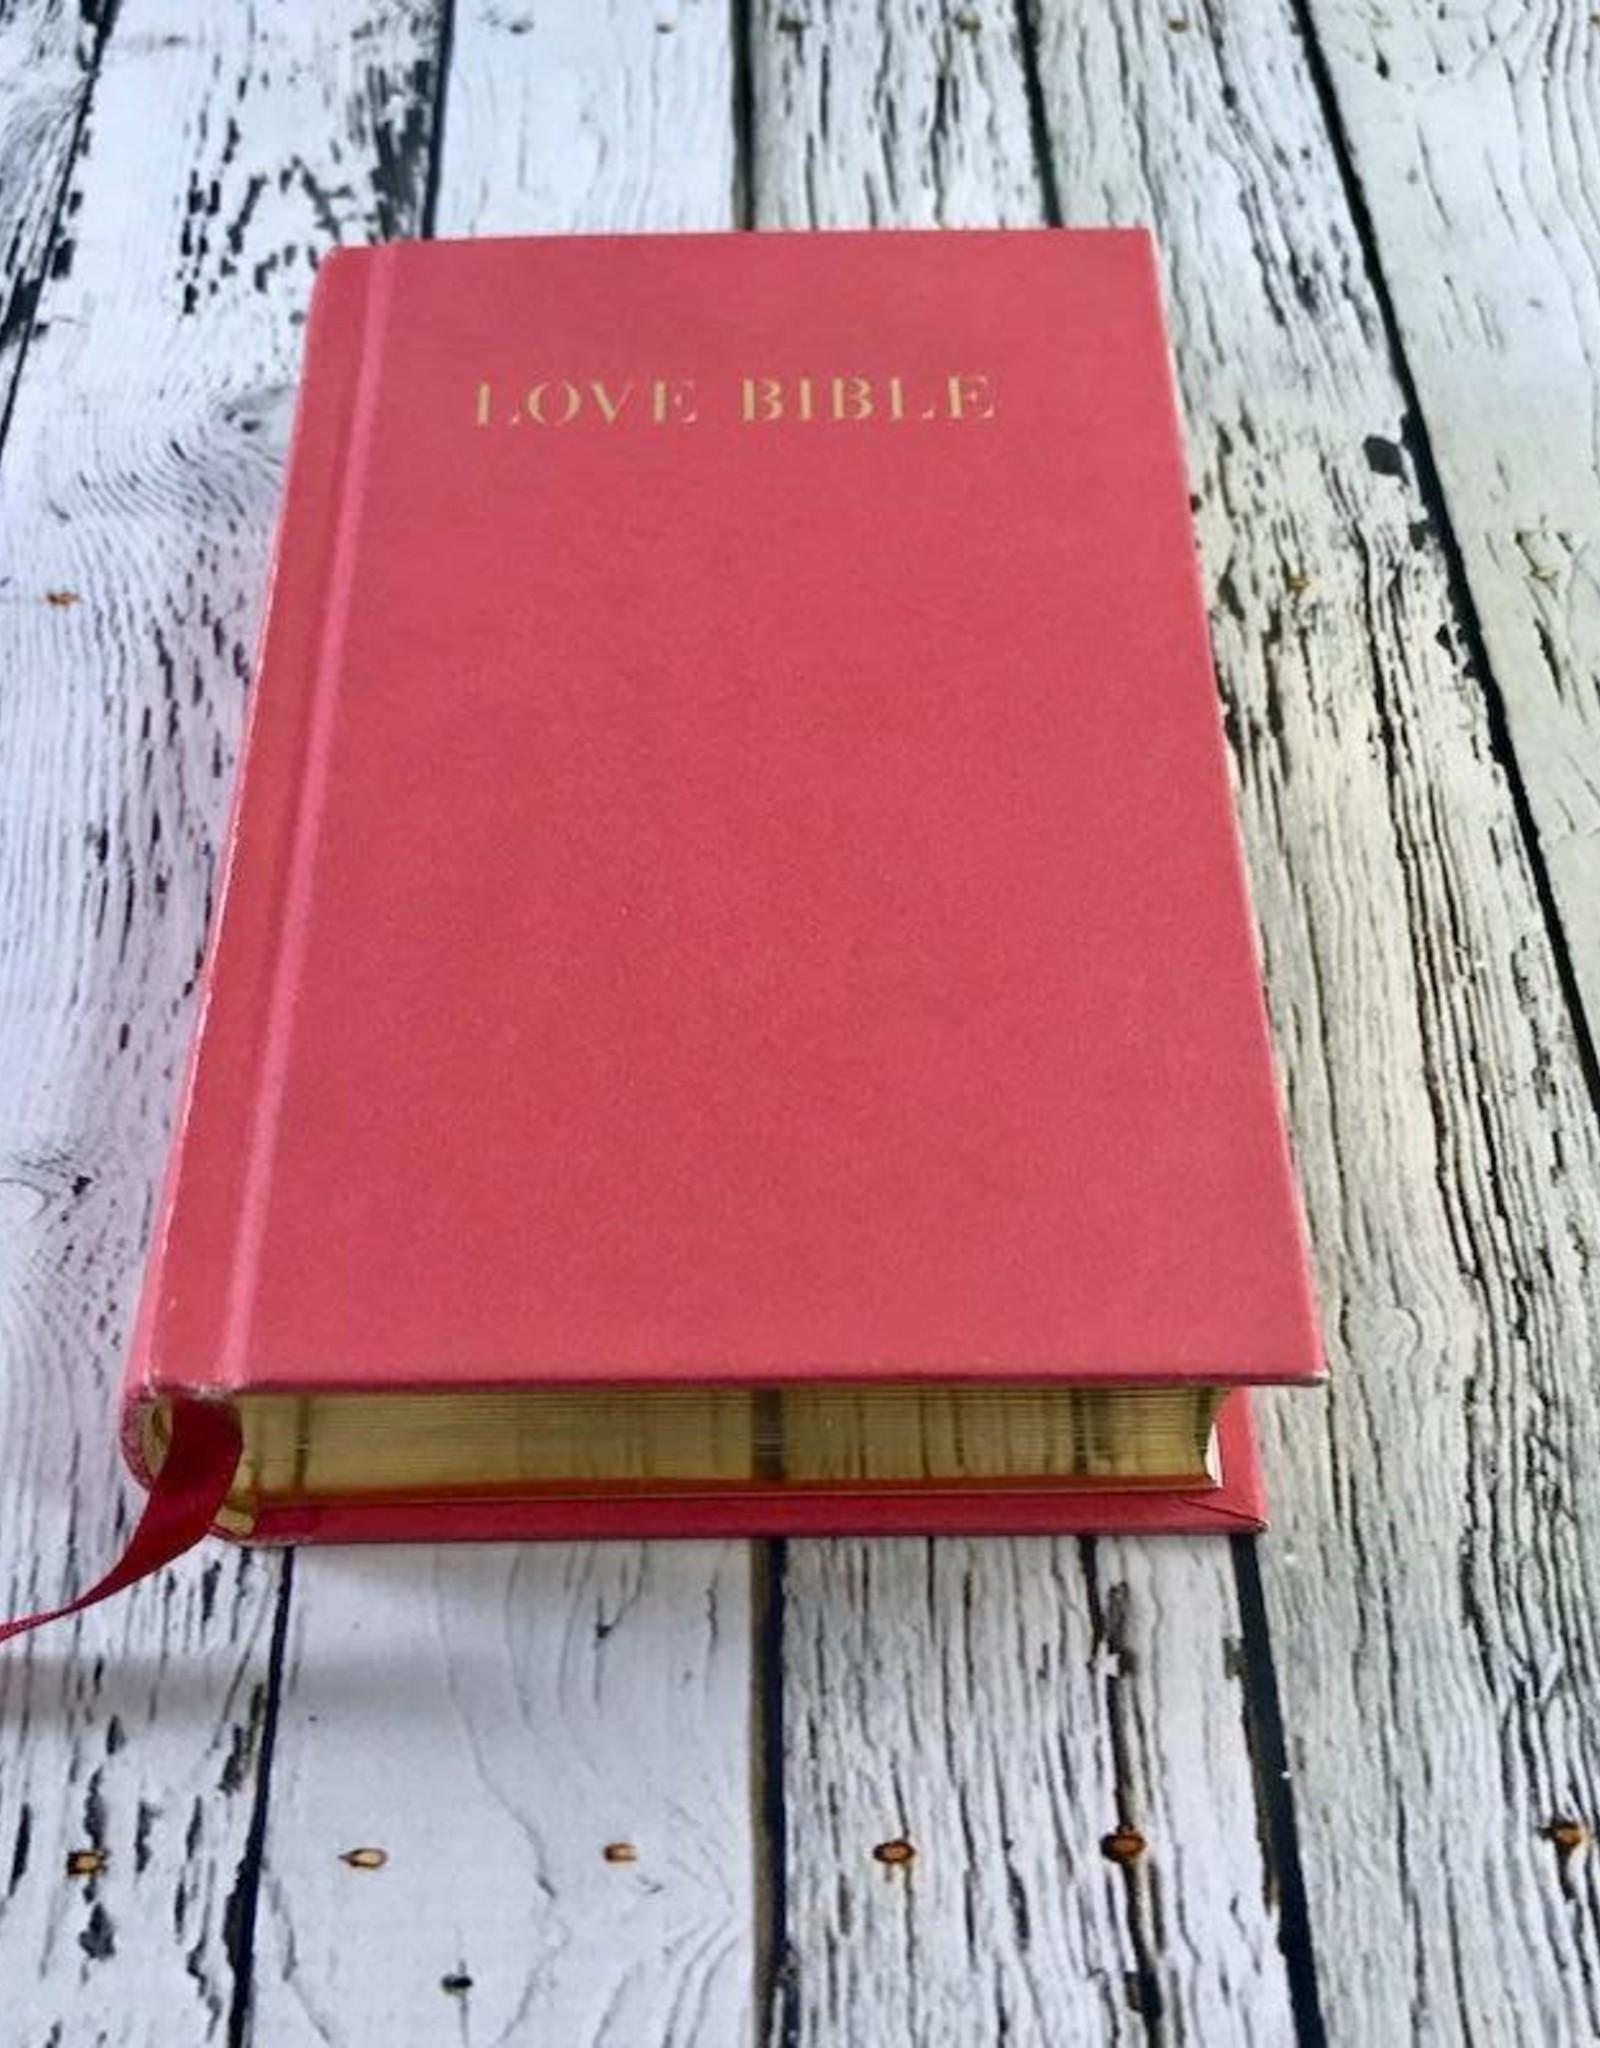 Love Bible - Words of Love